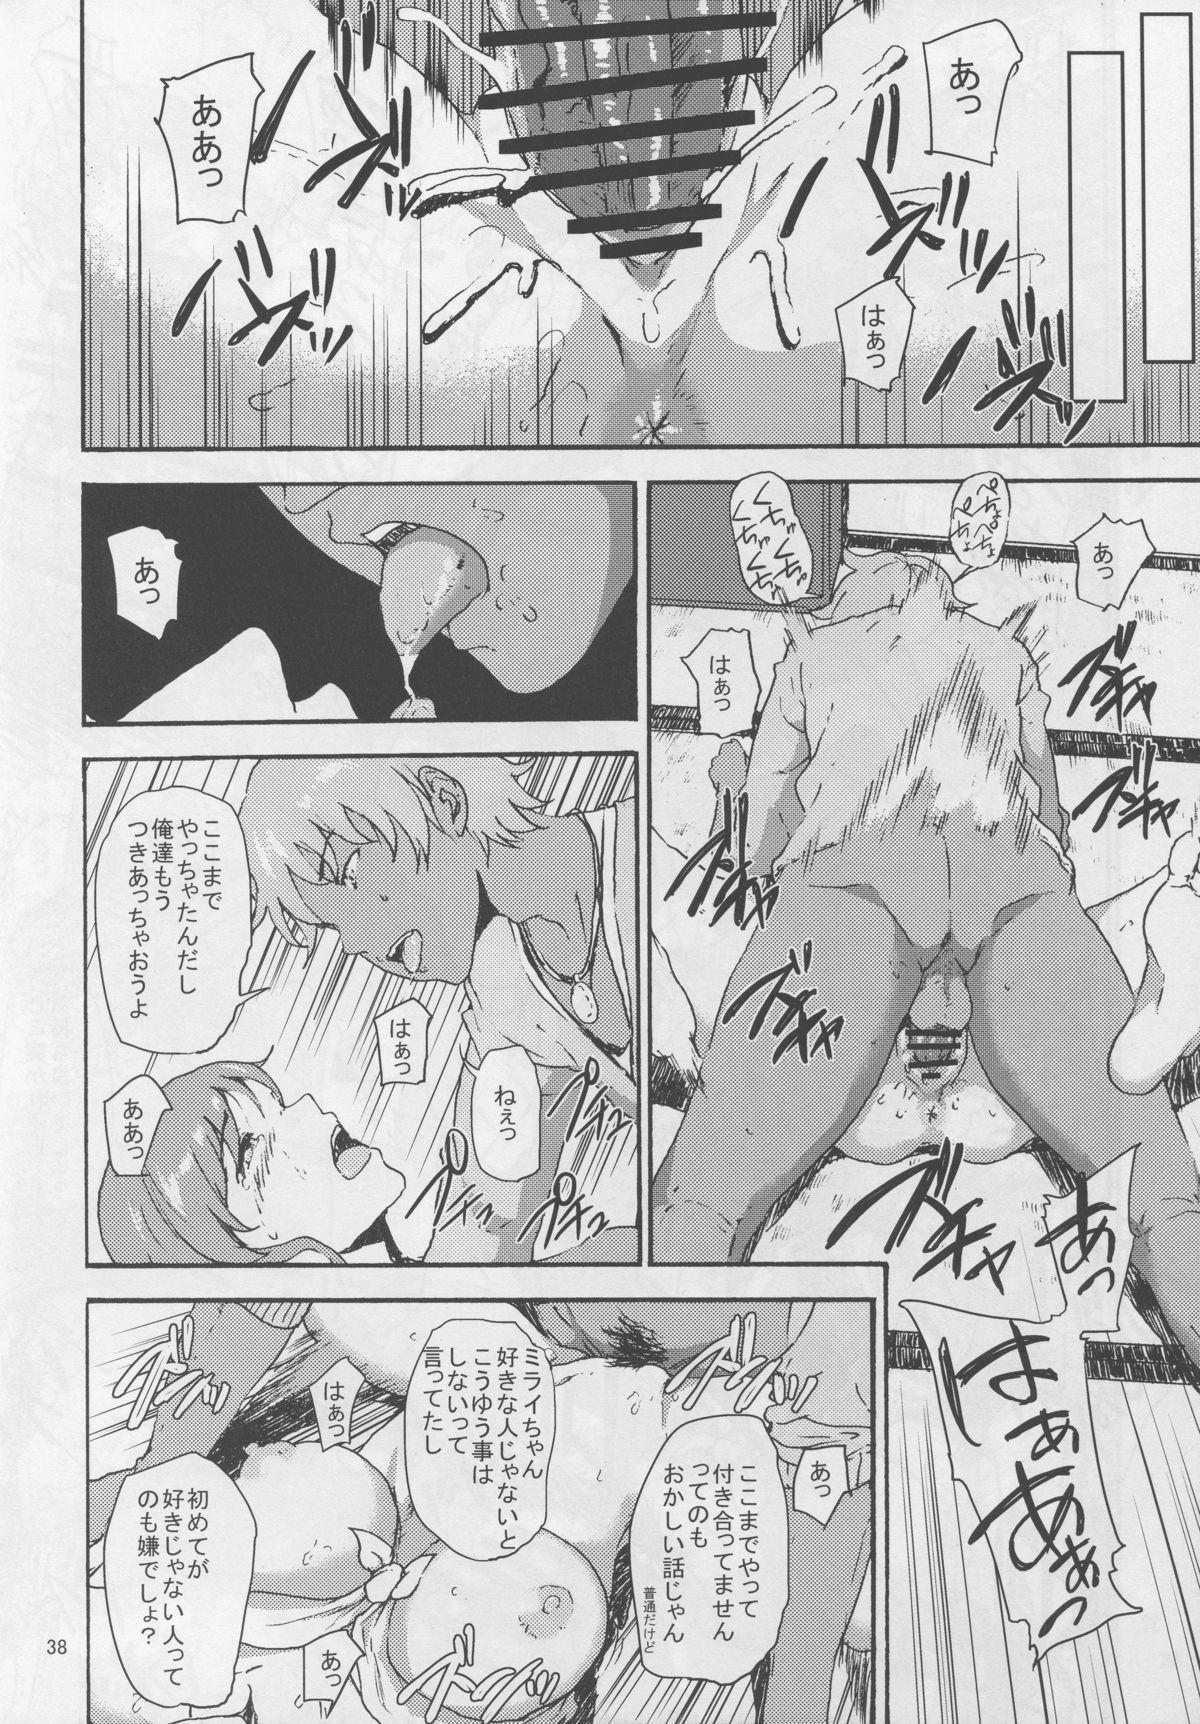 Mirai-chan ga Sandaime SGOCK no Leader ni Damasare Yarechau Hon 37